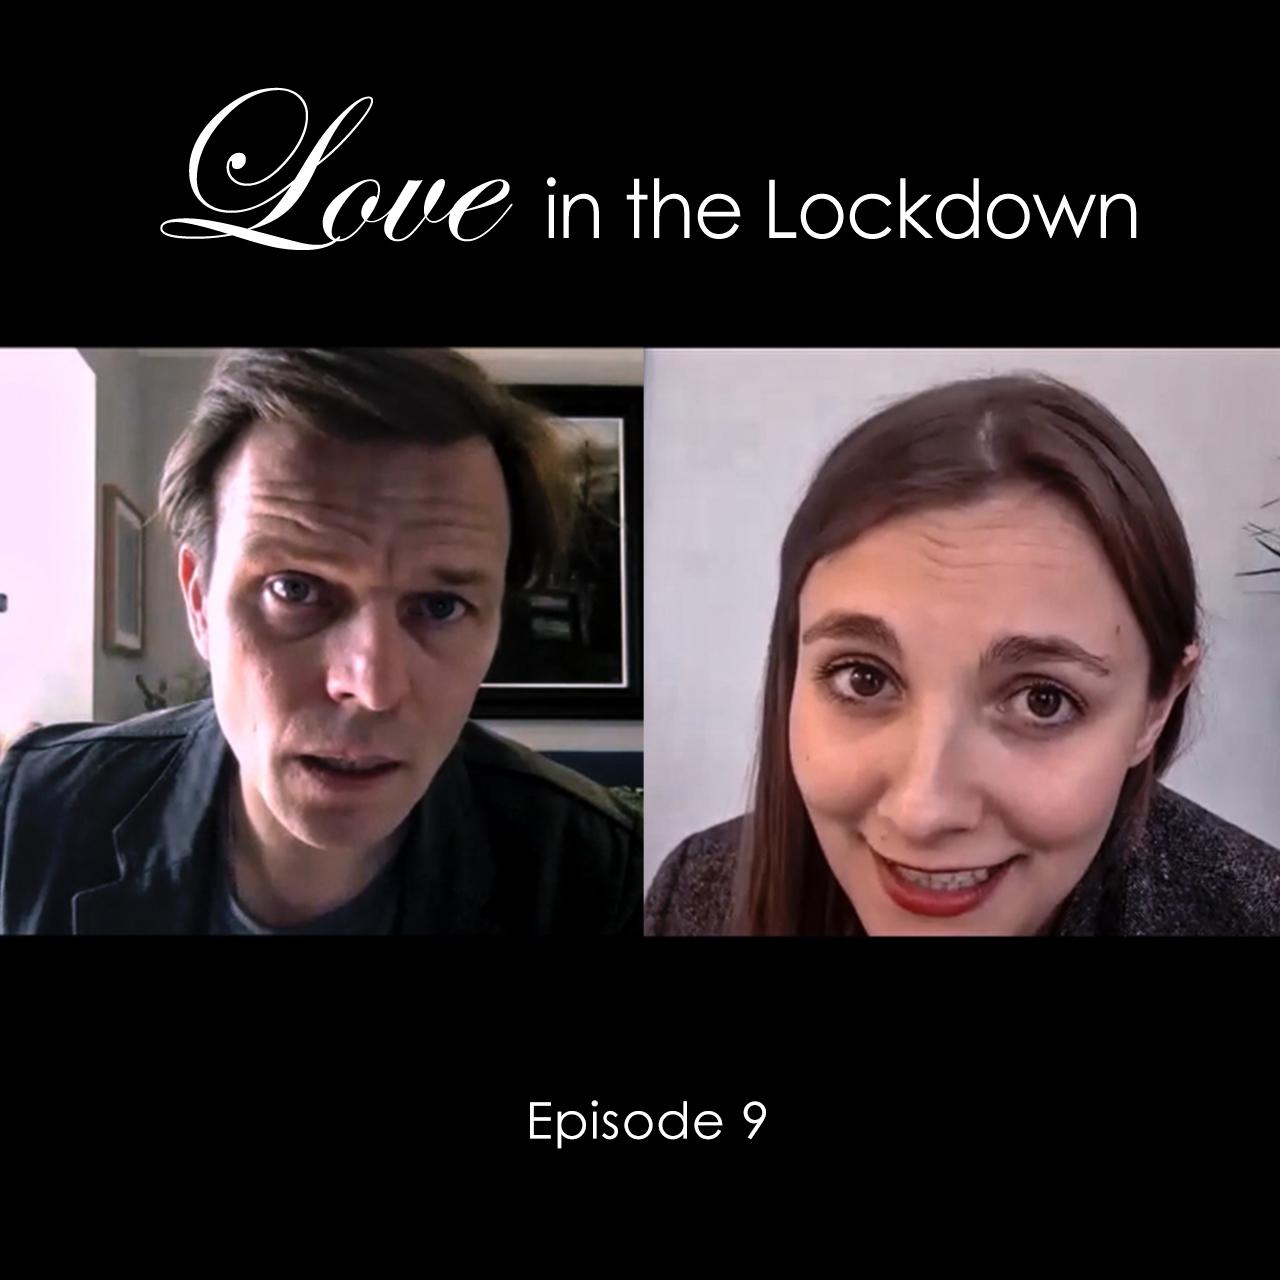 Love in the Lockdown Episode 9 Thumbnail